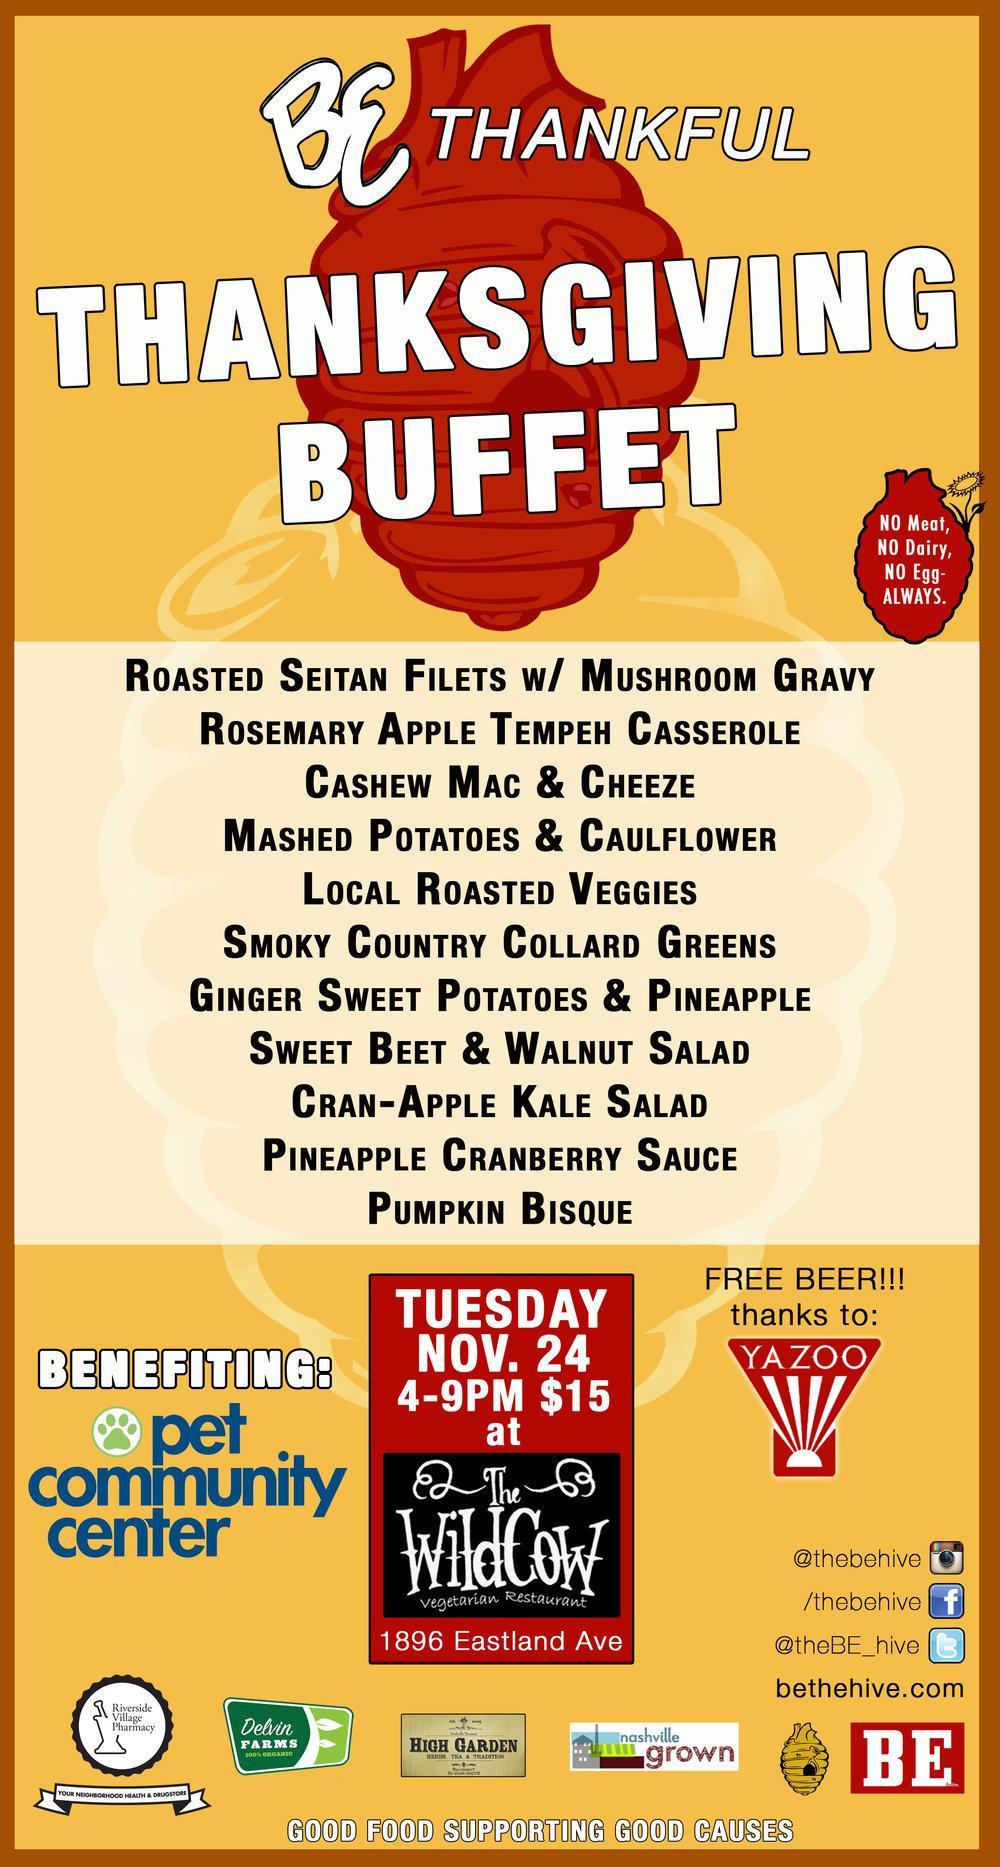 11.24.15 Thanksgiving Buffet tom.jpg